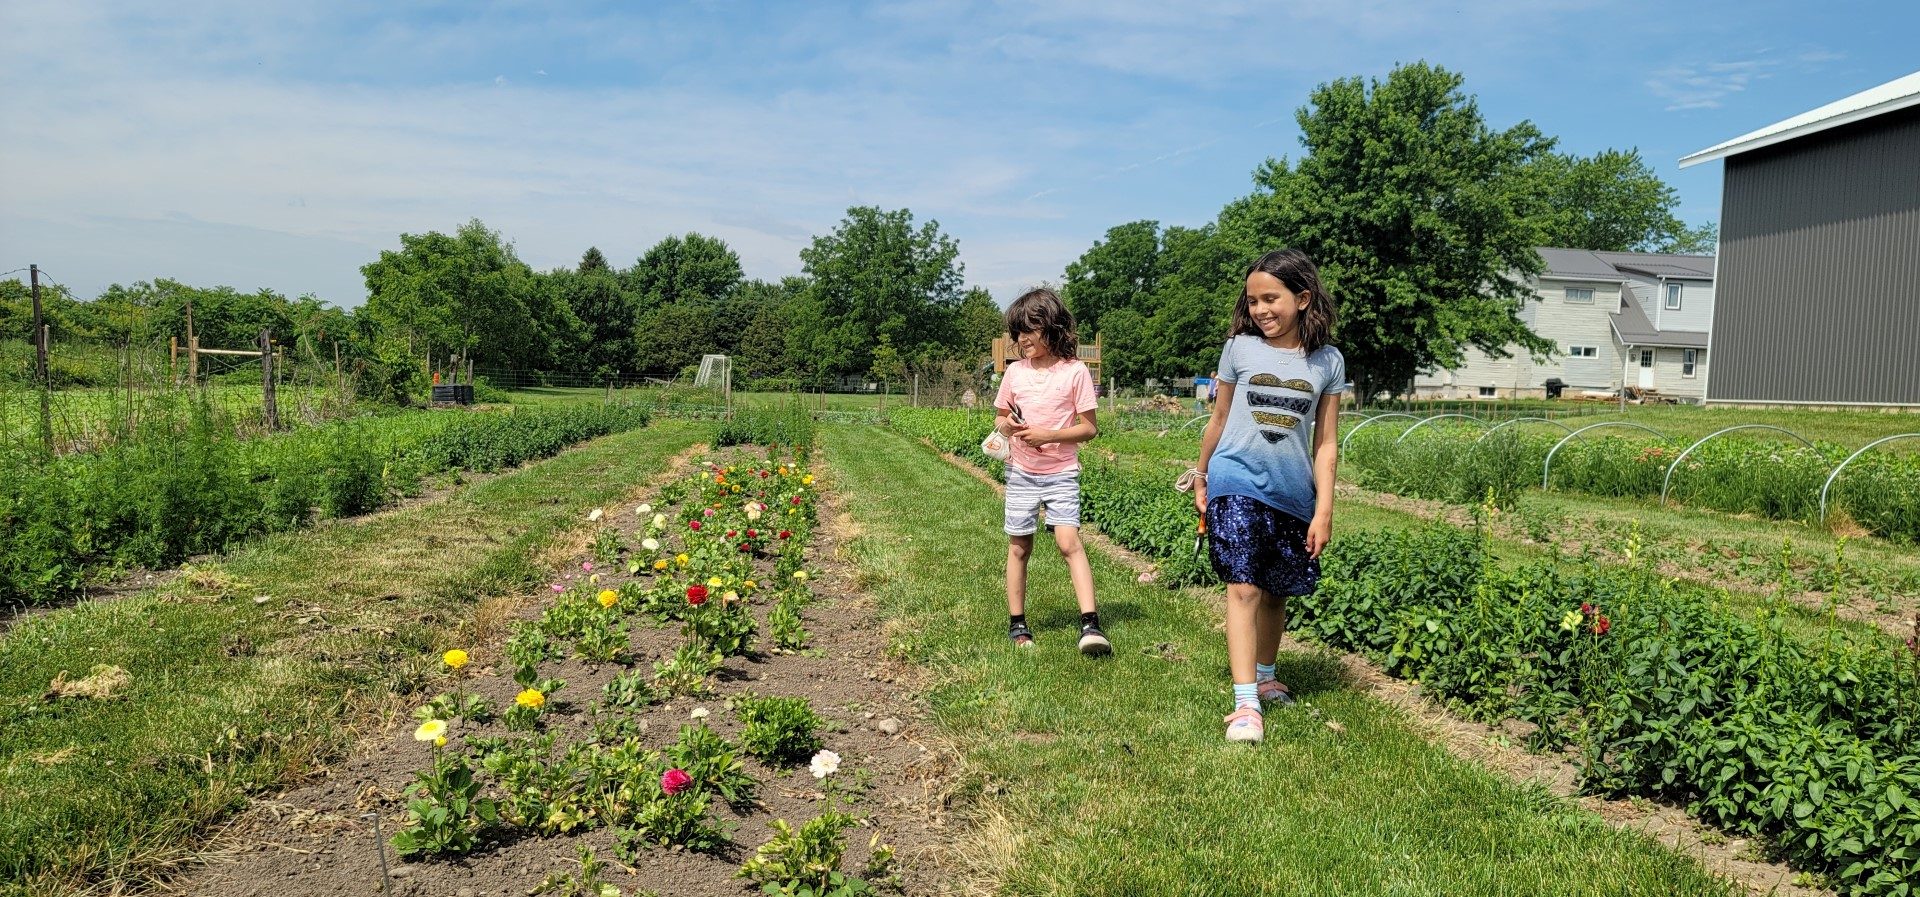 Kids running through flower fields